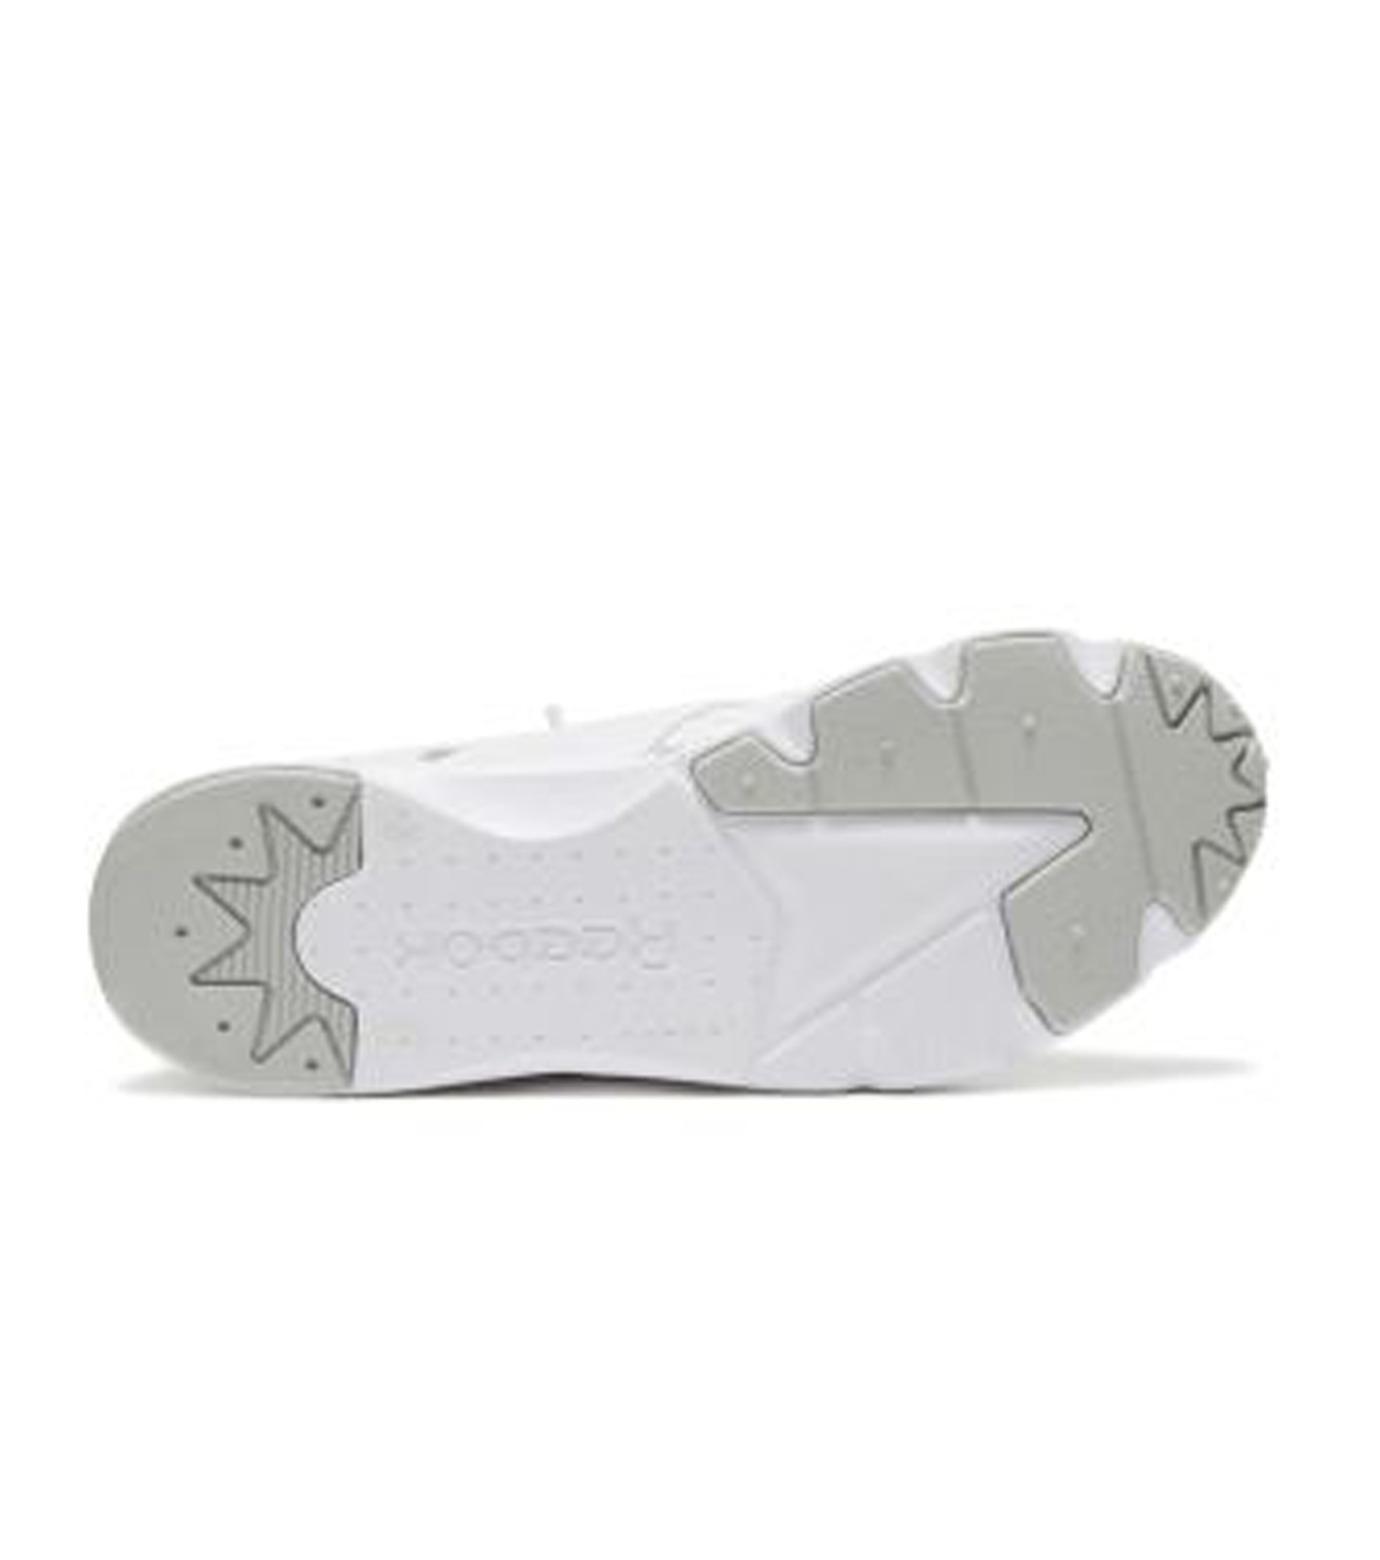 Reebok(リーボック)のFURYLITE NEW WOVEN-WHITE(シューズ/shoes)-V70797-4 拡大詳細画像2